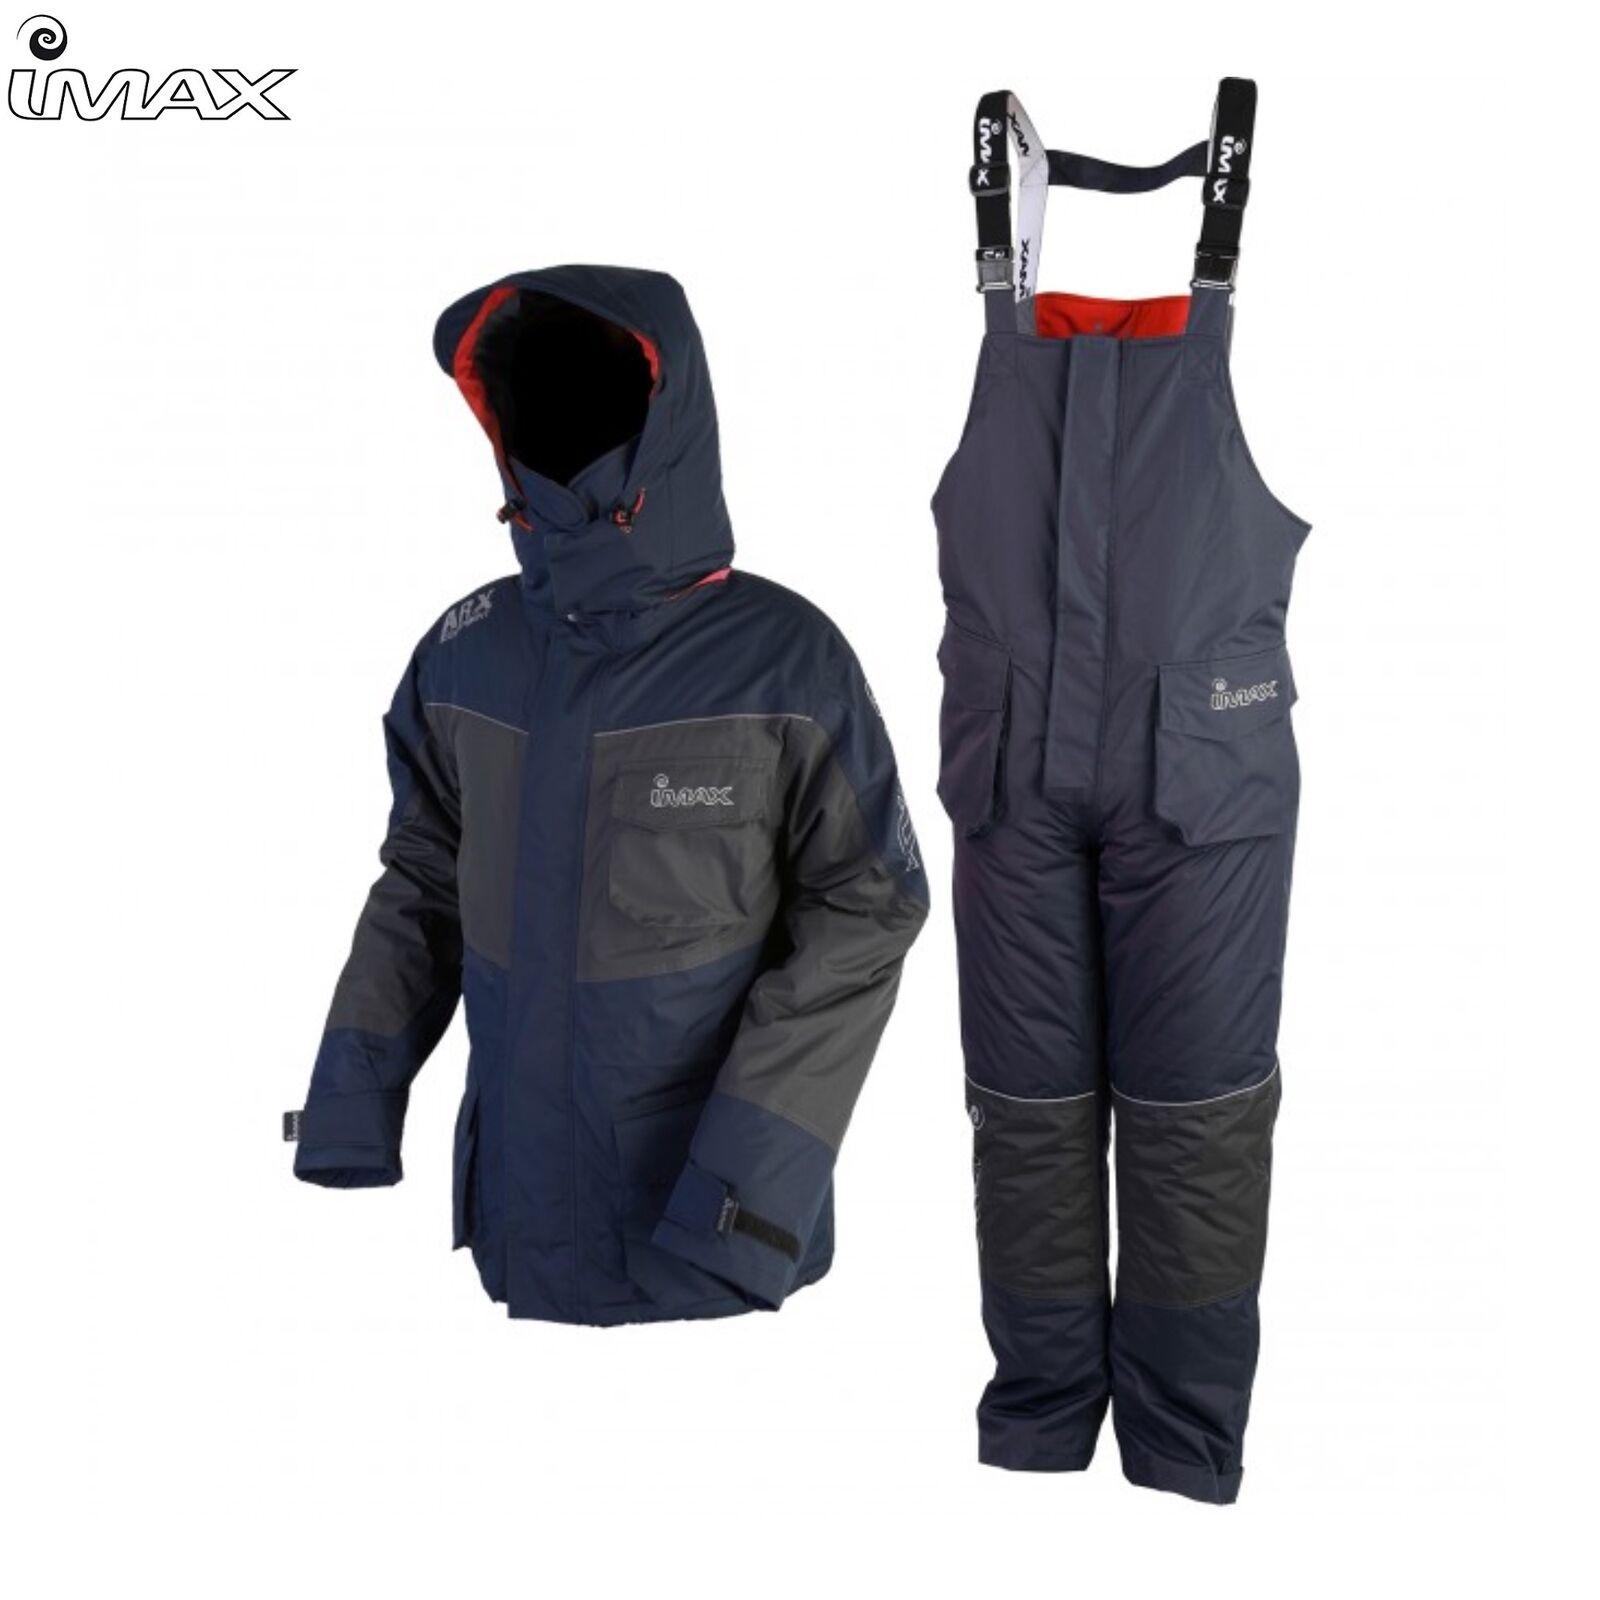 IMAX ARX20 ICE Thermo Tuta   Giacca  Pantaloni B&B   100% Poliestere Microfibra